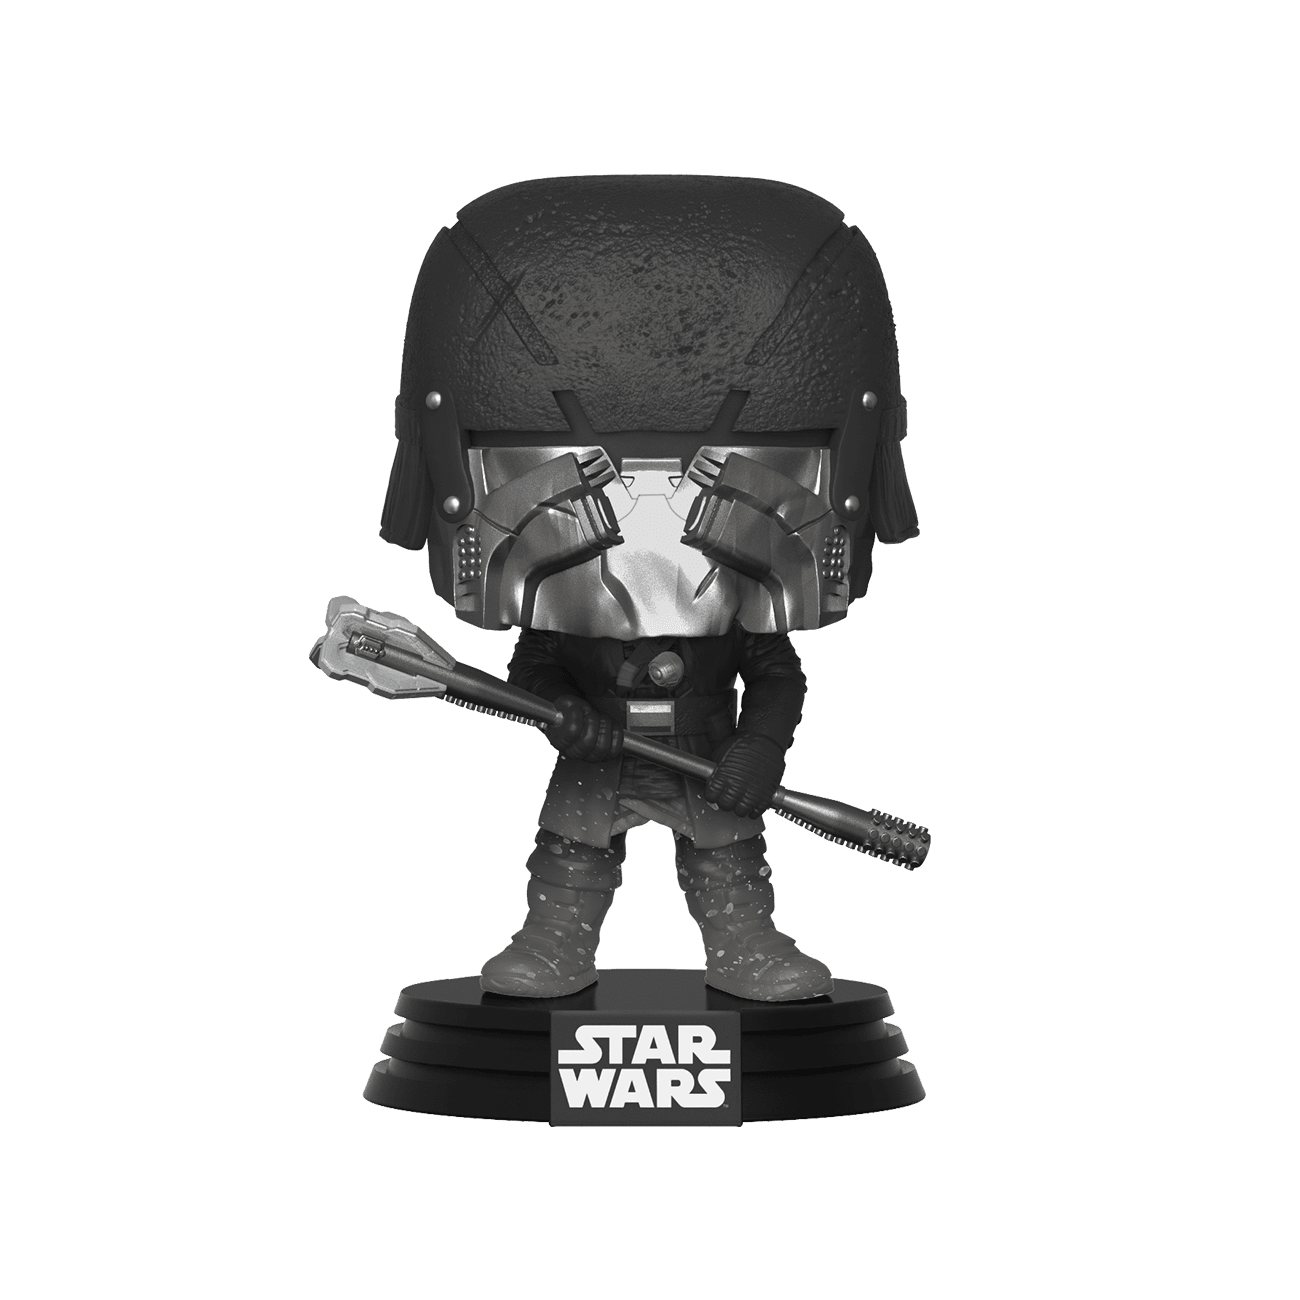 Star Wars: The Rise of Skywalker Knight of Ren Club Exclusive Pop! Vinyl Figure